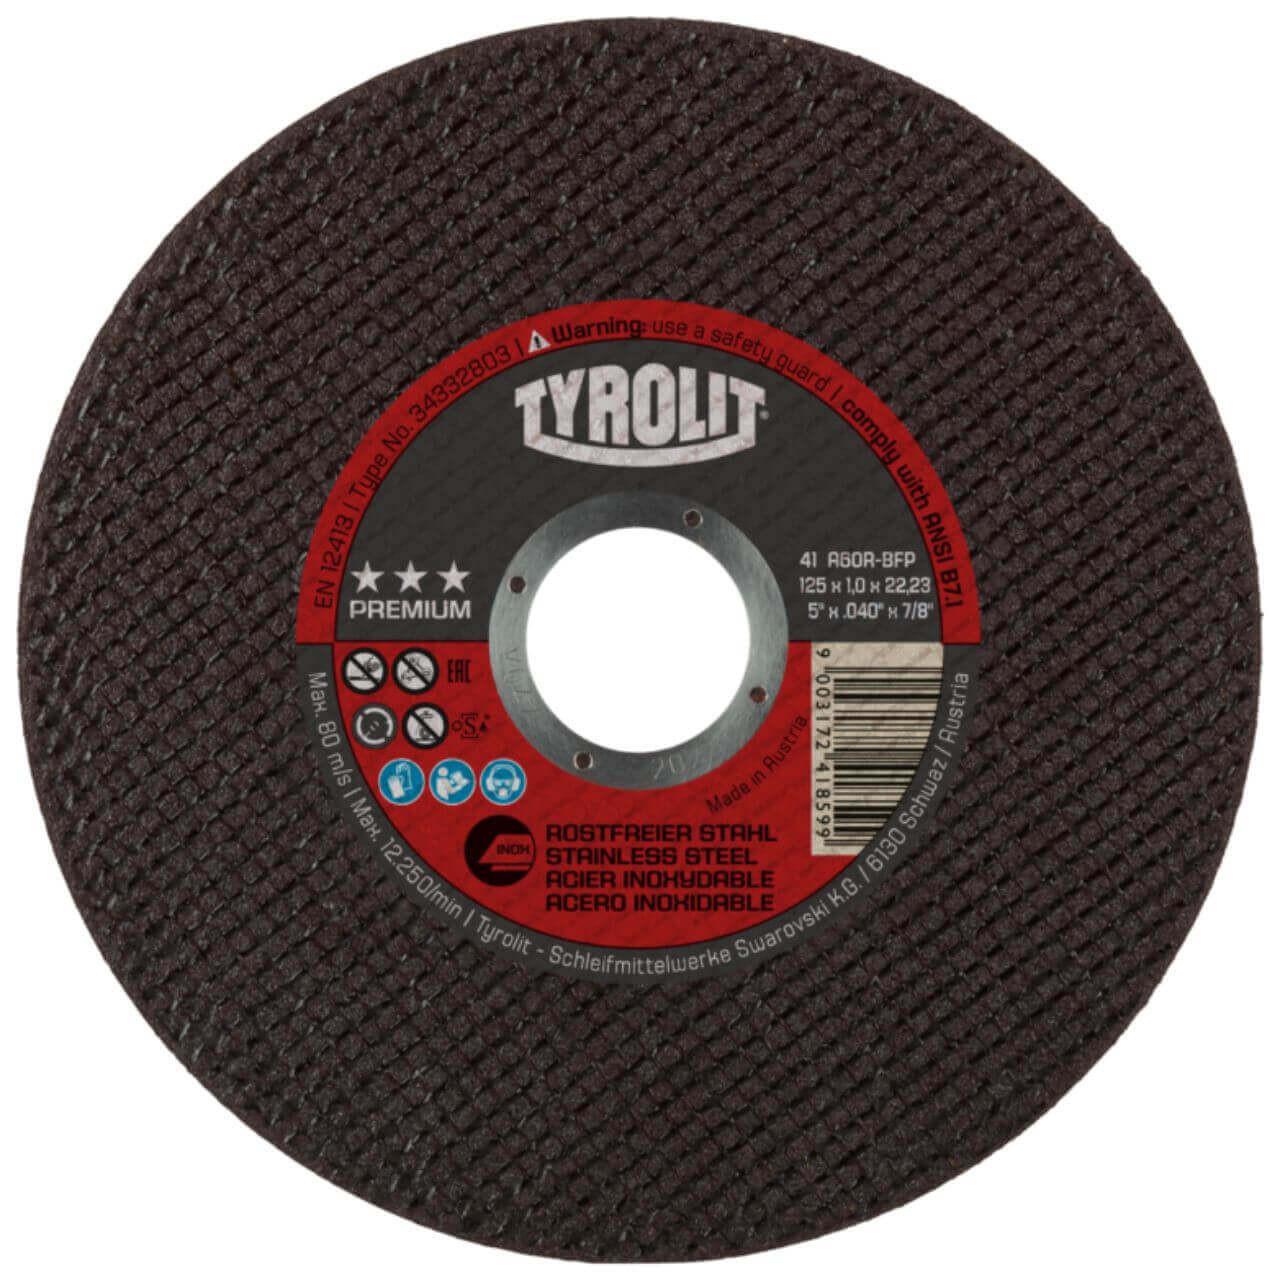 Tyrolit A60R 125x1x22 Inox Premium Cutting Disc